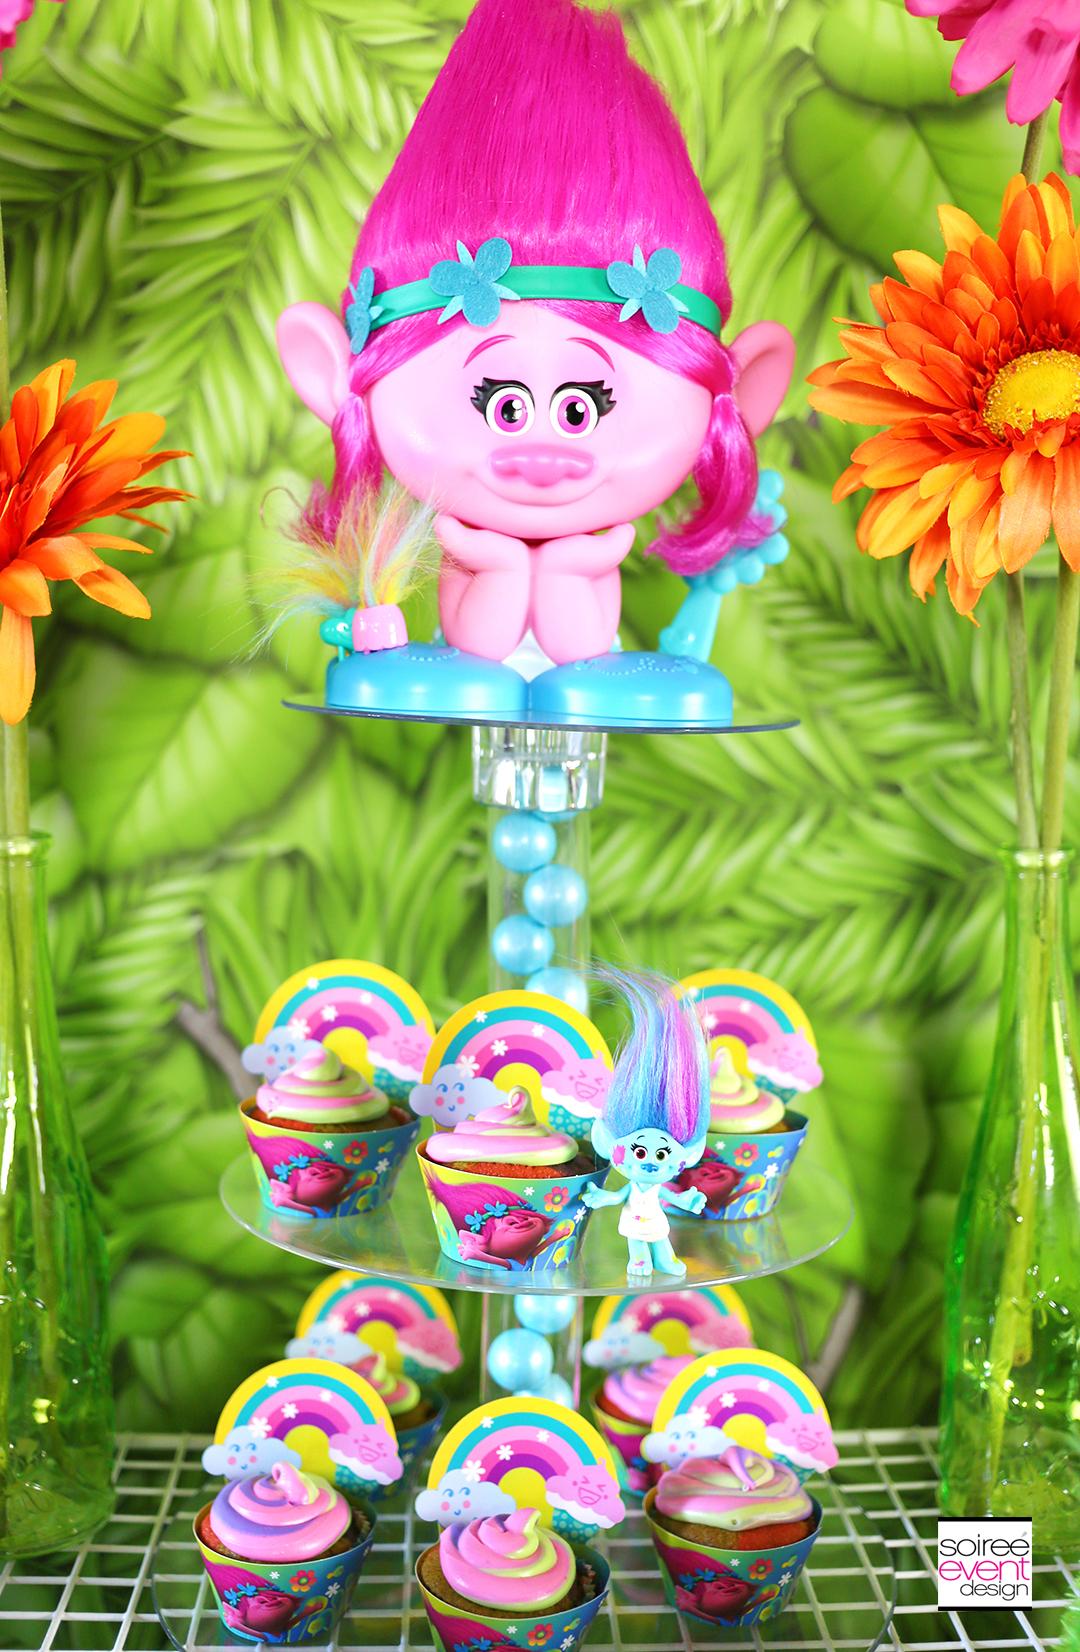 Trolls party ideas - Trolls Cupcake Stand